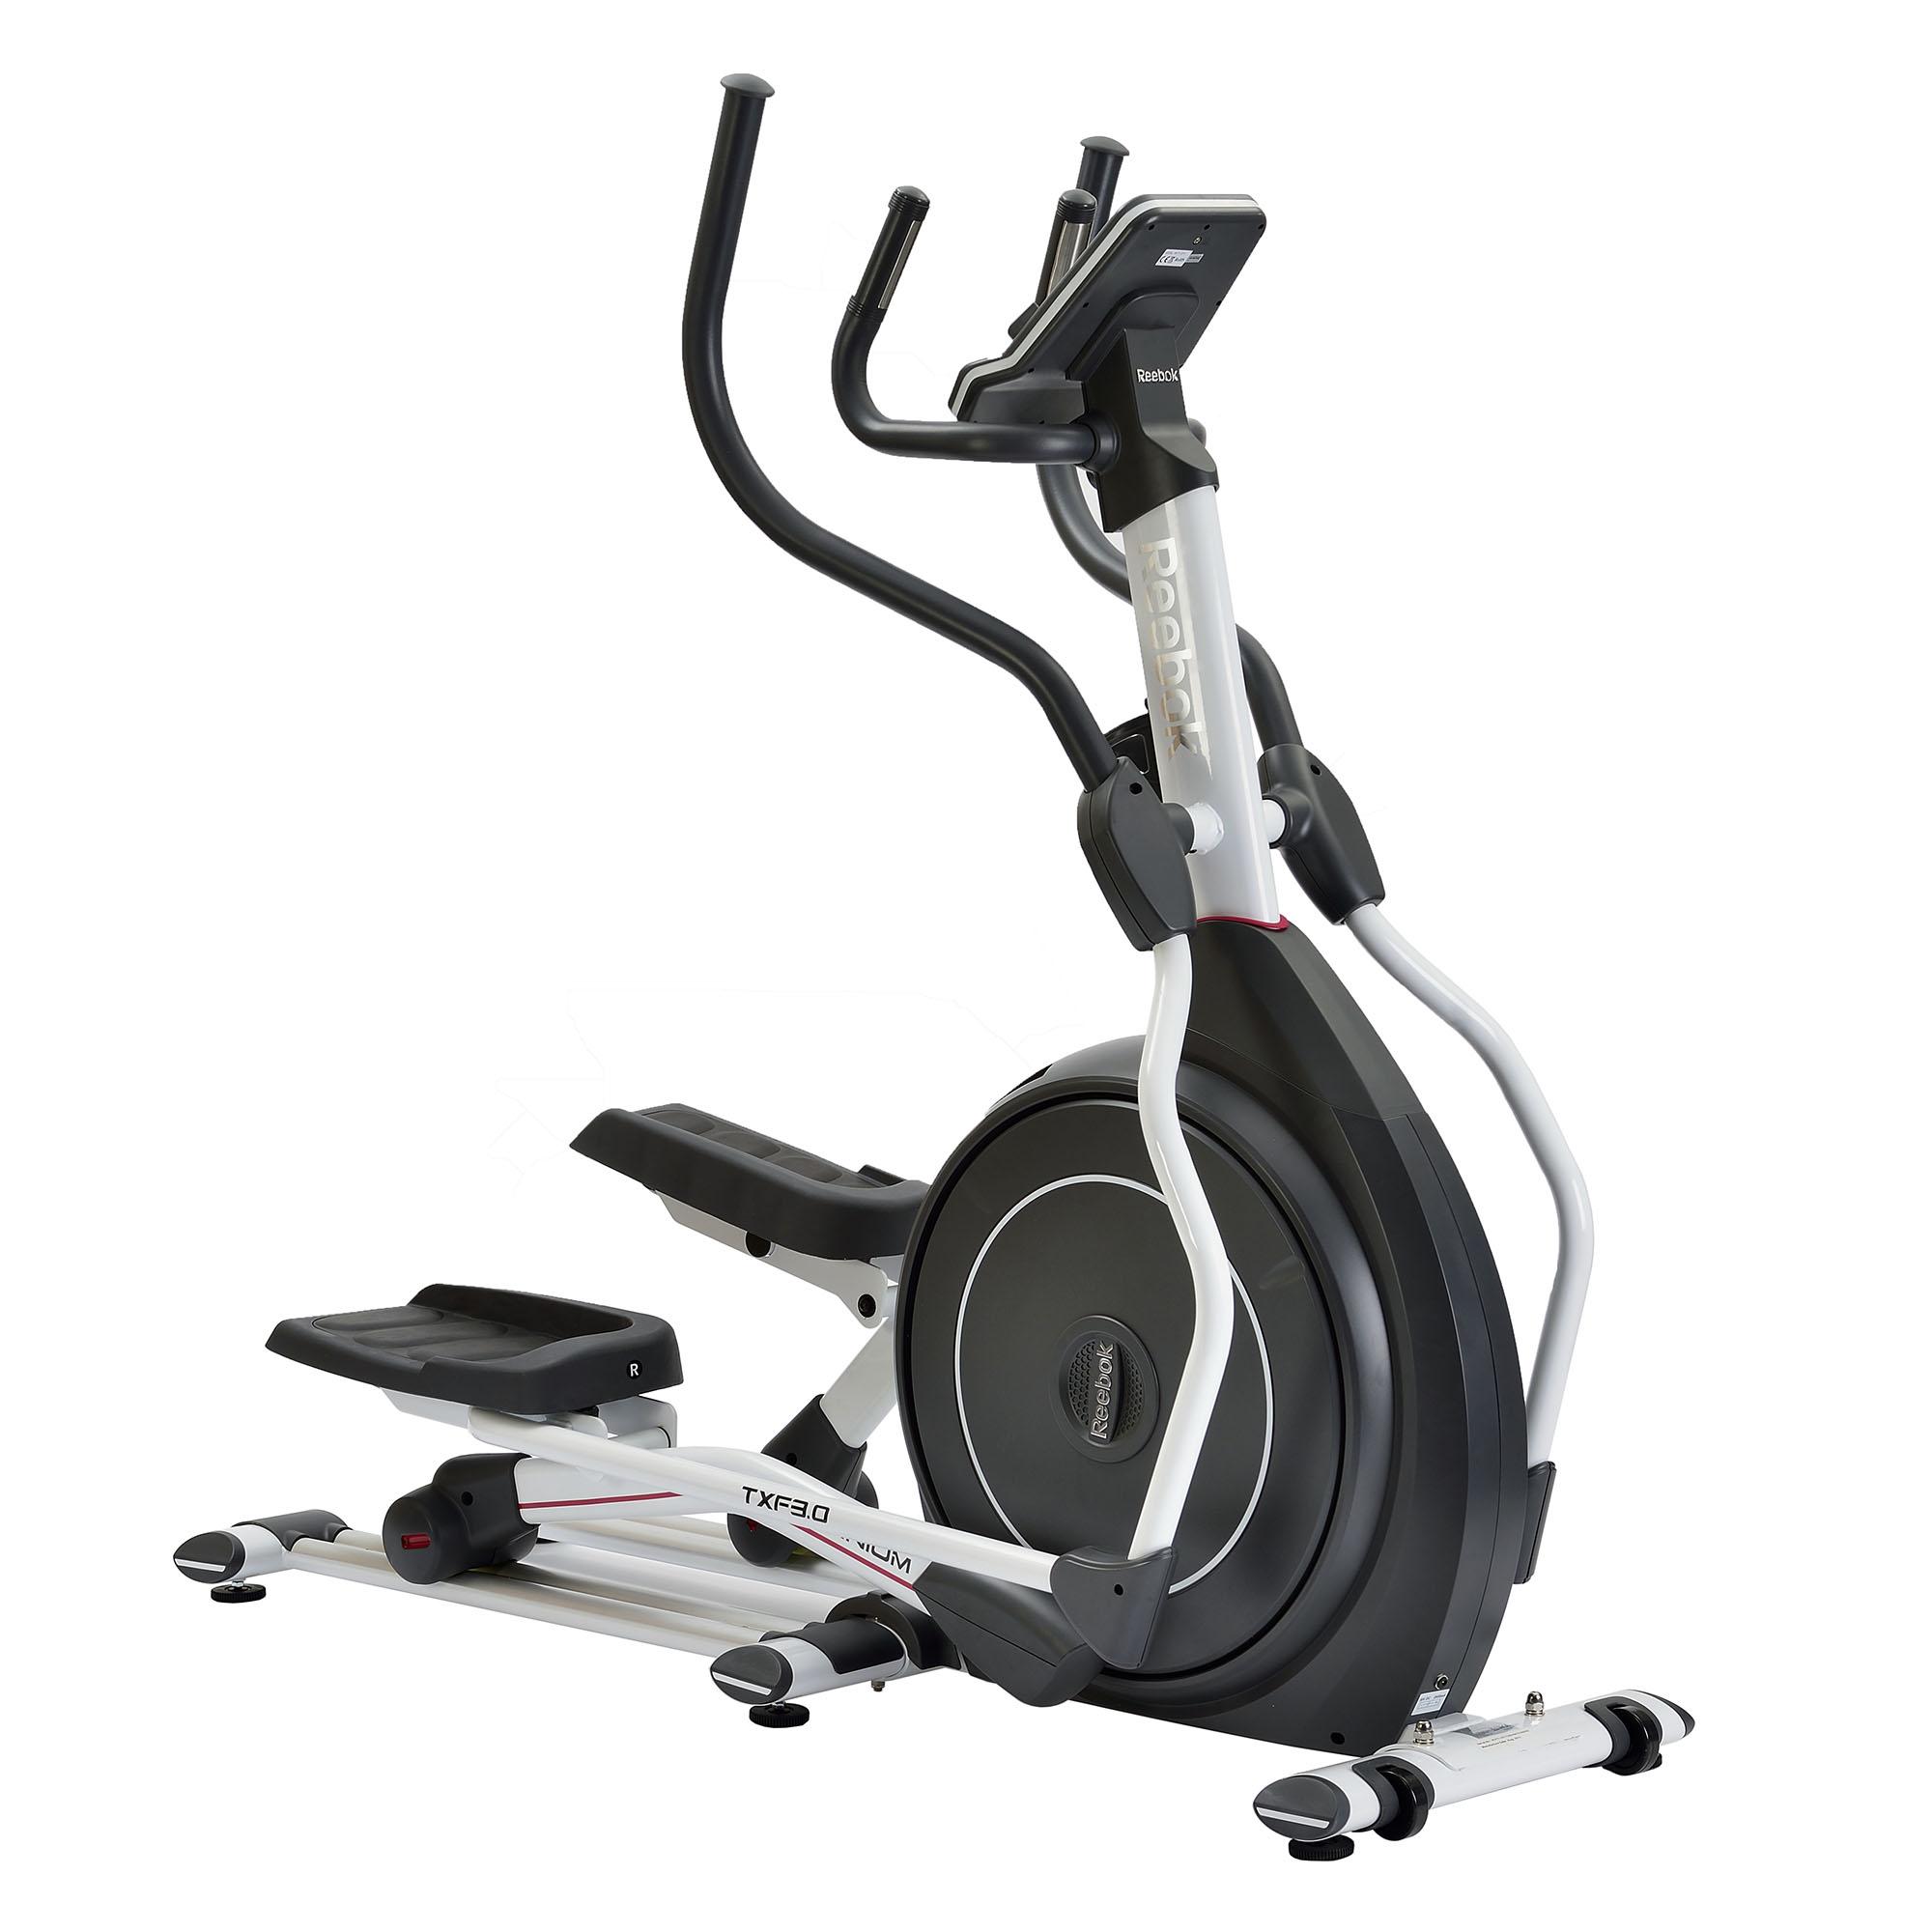 Gym Equipment Wholesale Price In India 91mobiles, Reebok